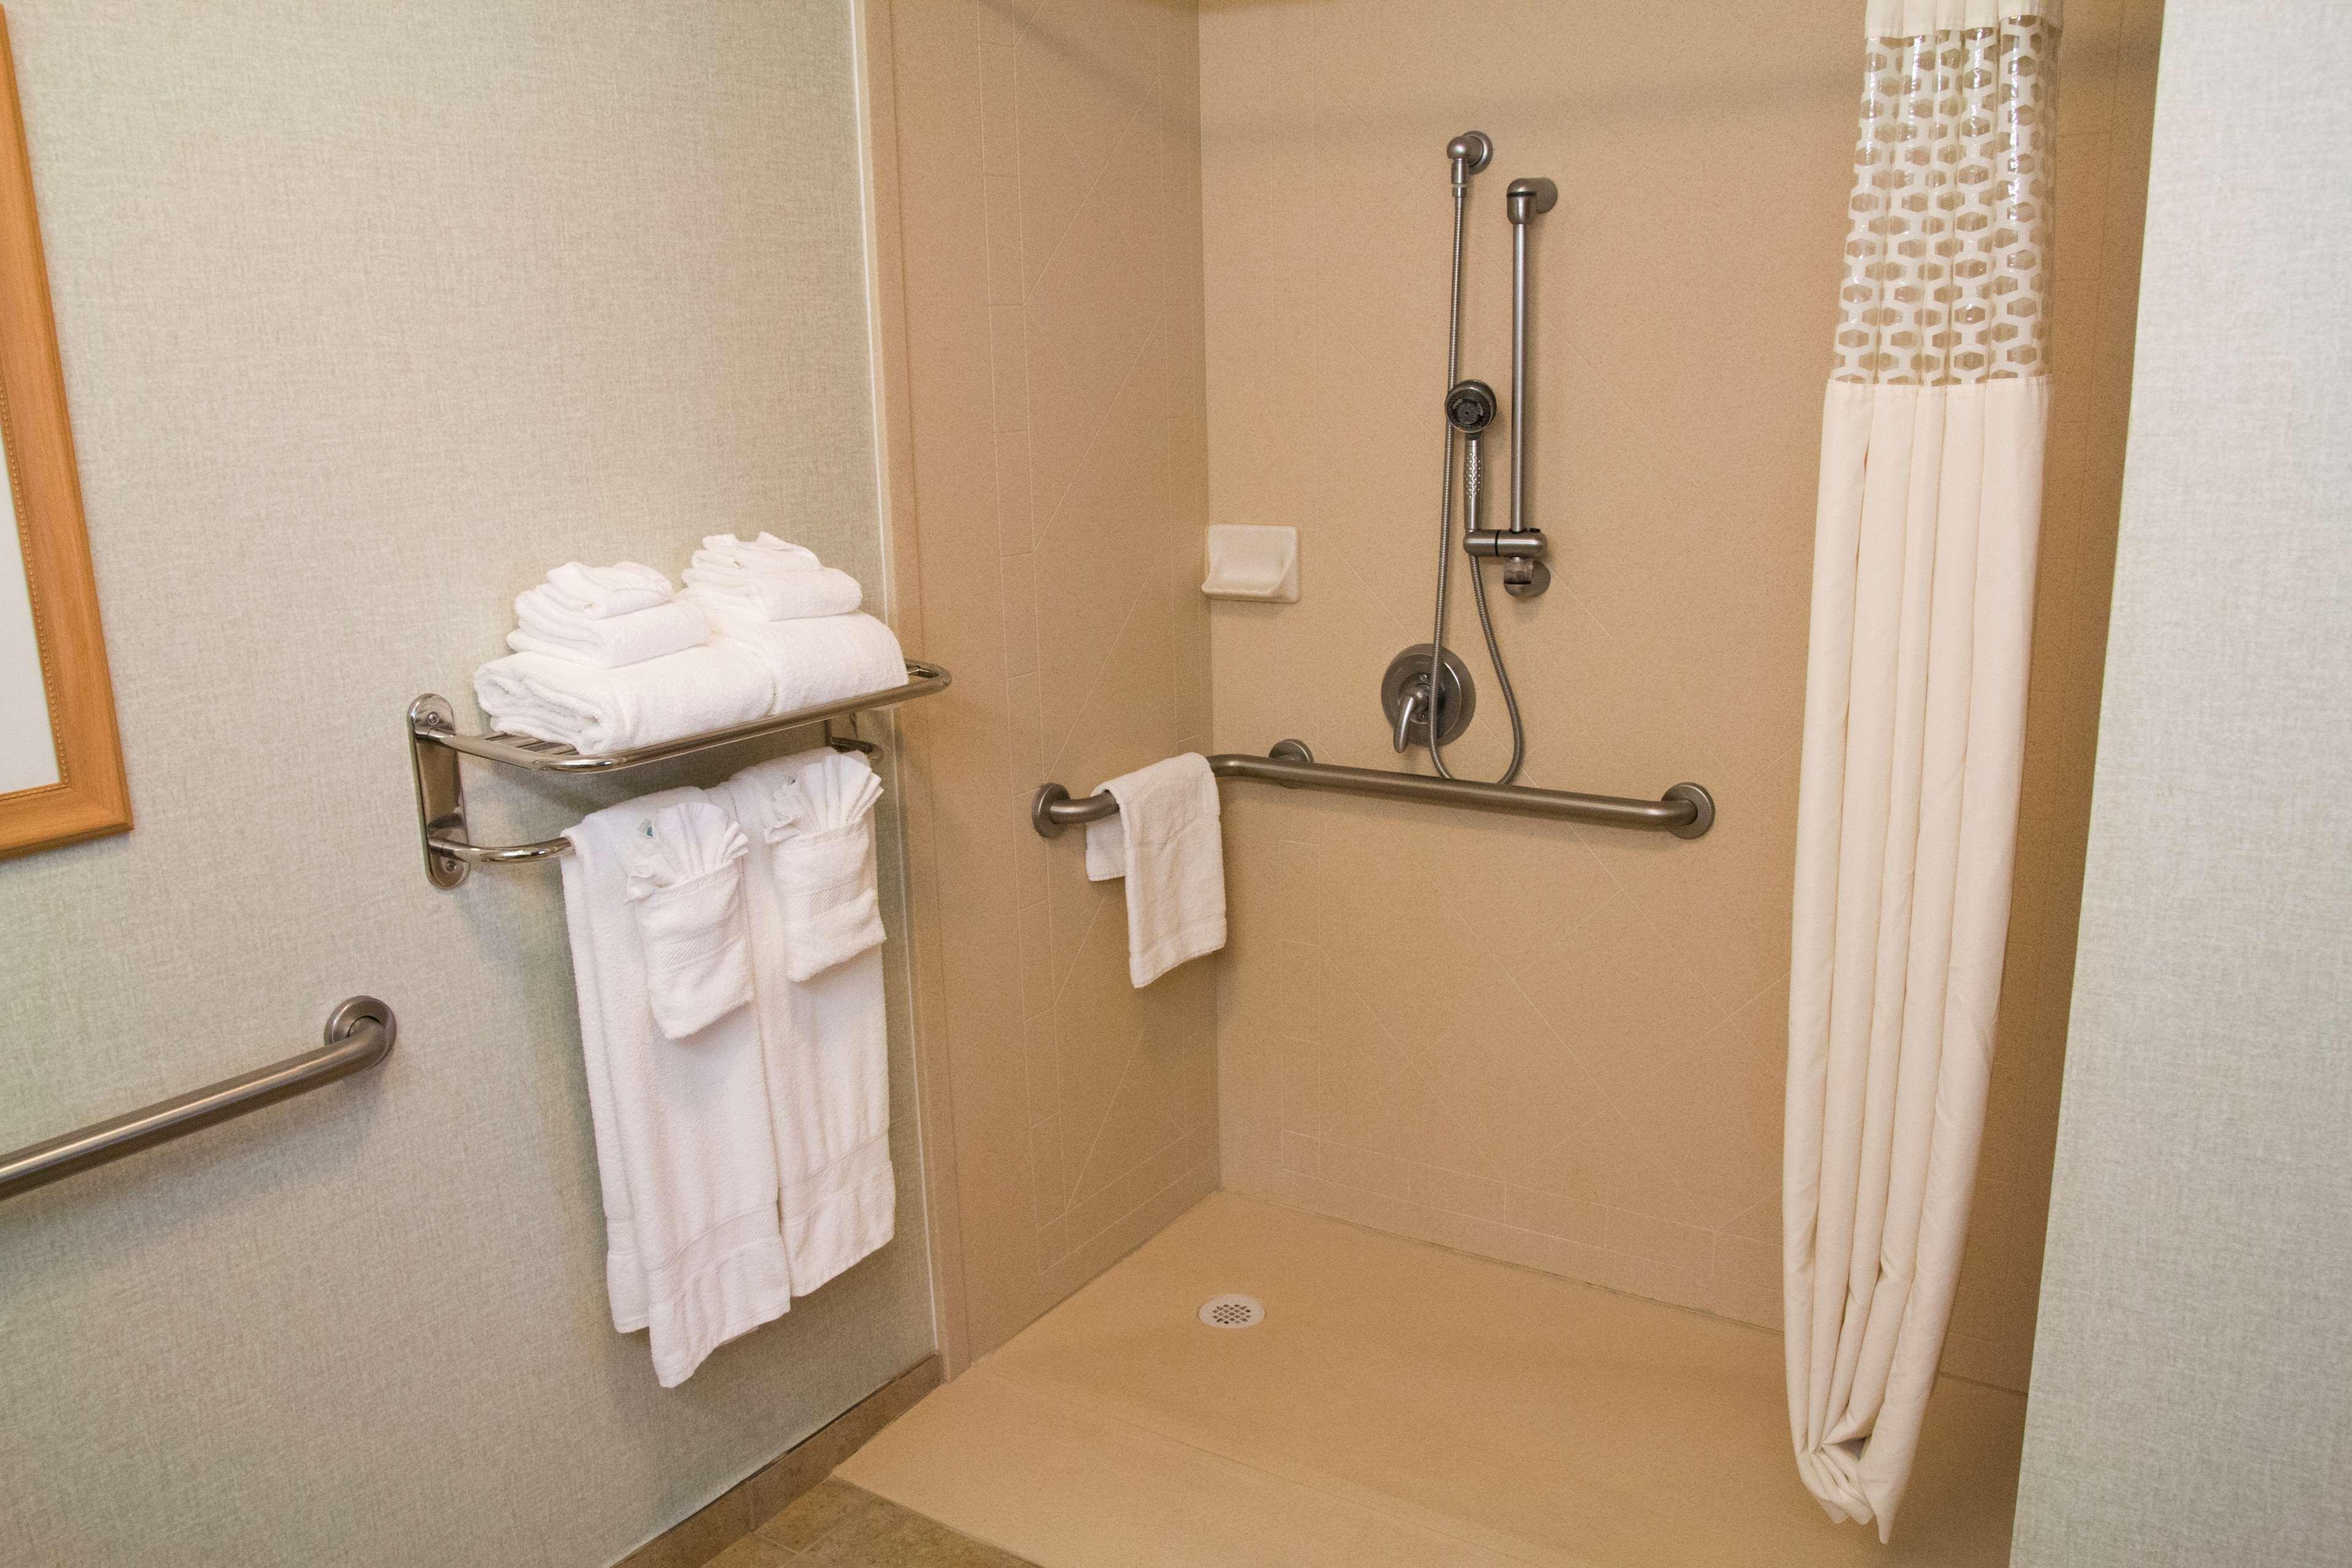 Hampton Inn & Suites Madera image 32